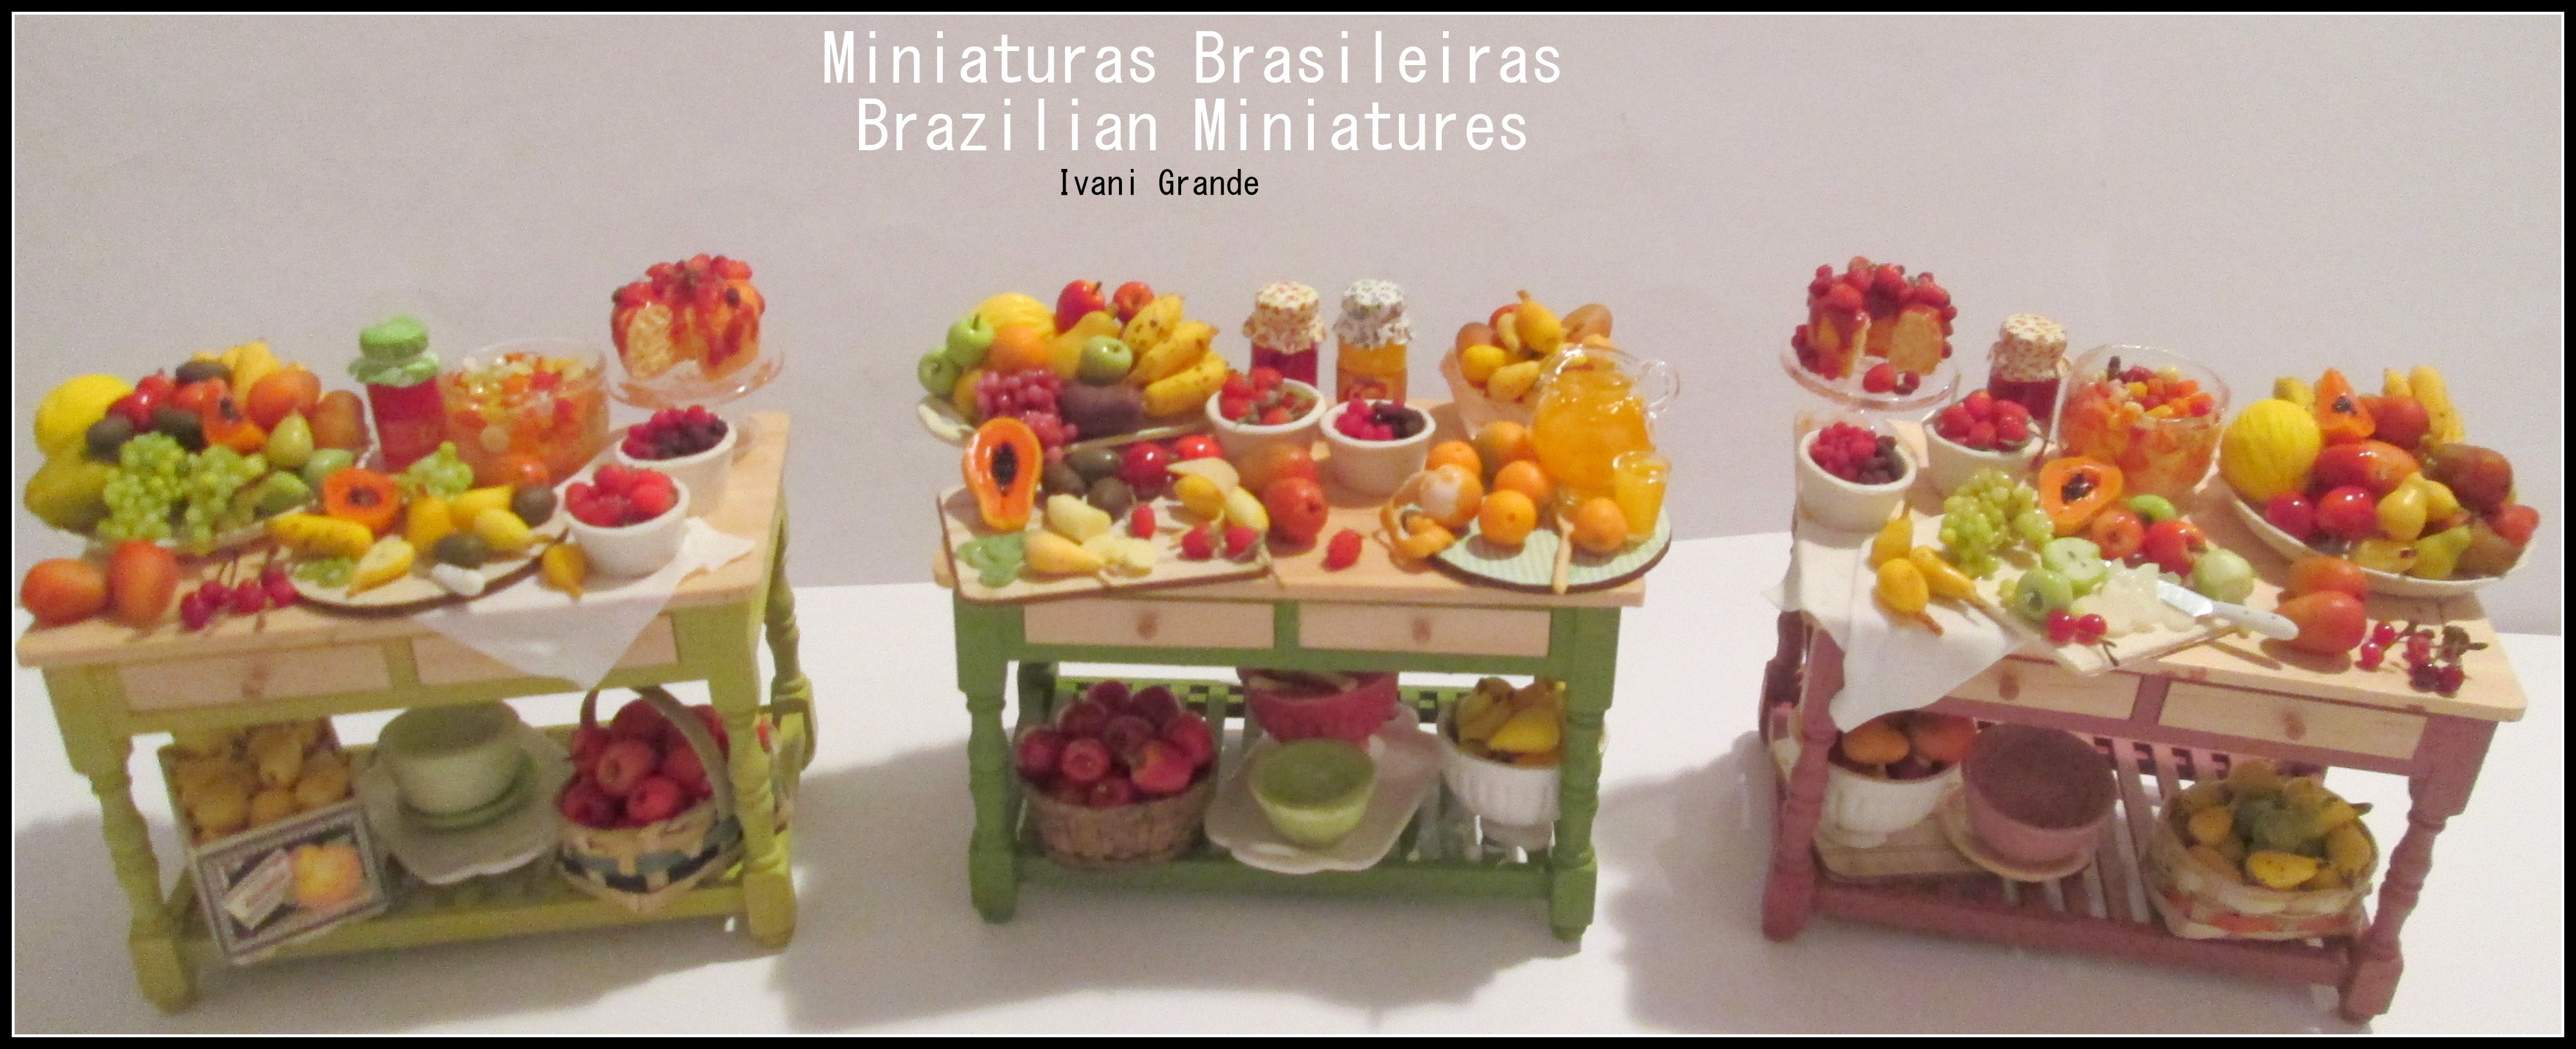 Miniaturas Brasileiras  Brazilian Miniatures   Ivani Grande